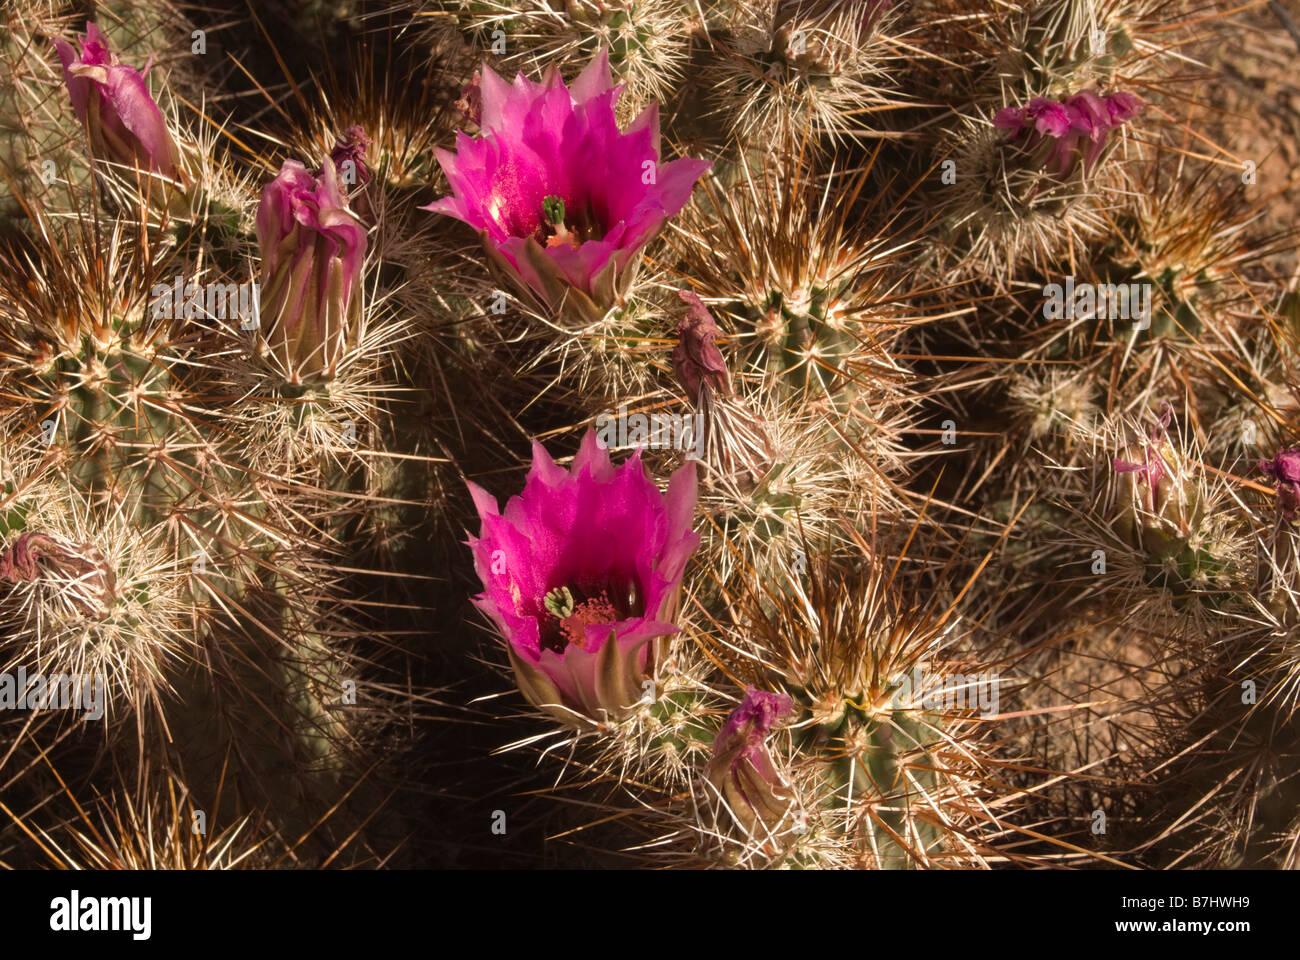 USA Arizona Picacho Cactus in bloom Picacho Peak State Park Stock Photo